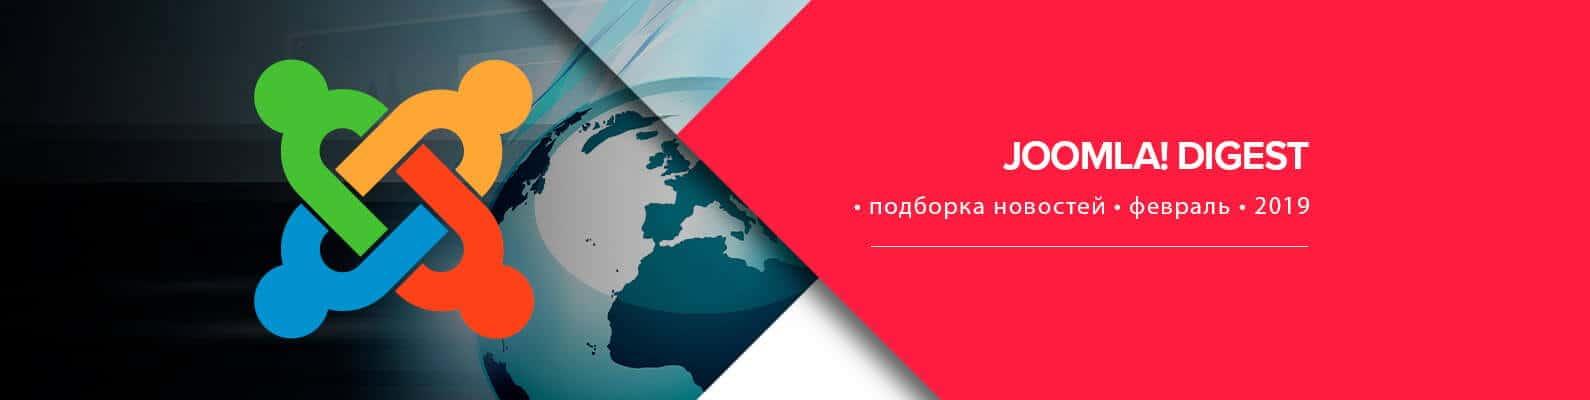 Дайджест Joomla за февраль 2019